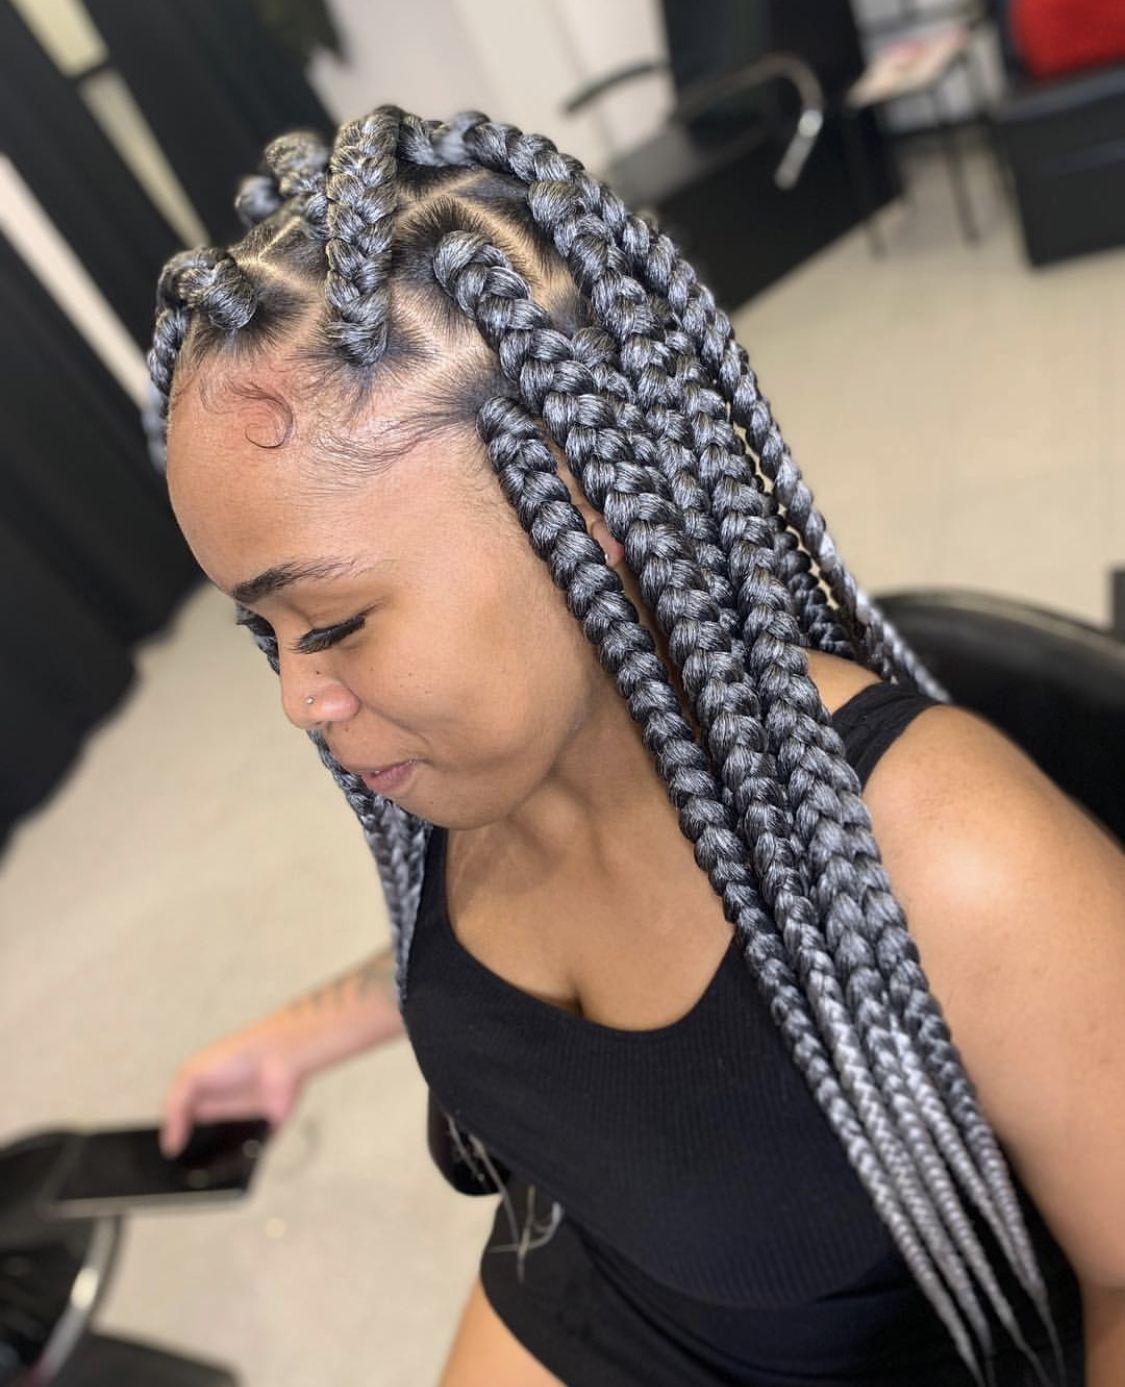 Braided Hairstyles for Little Girls hairstyleforblackwomen.net 205